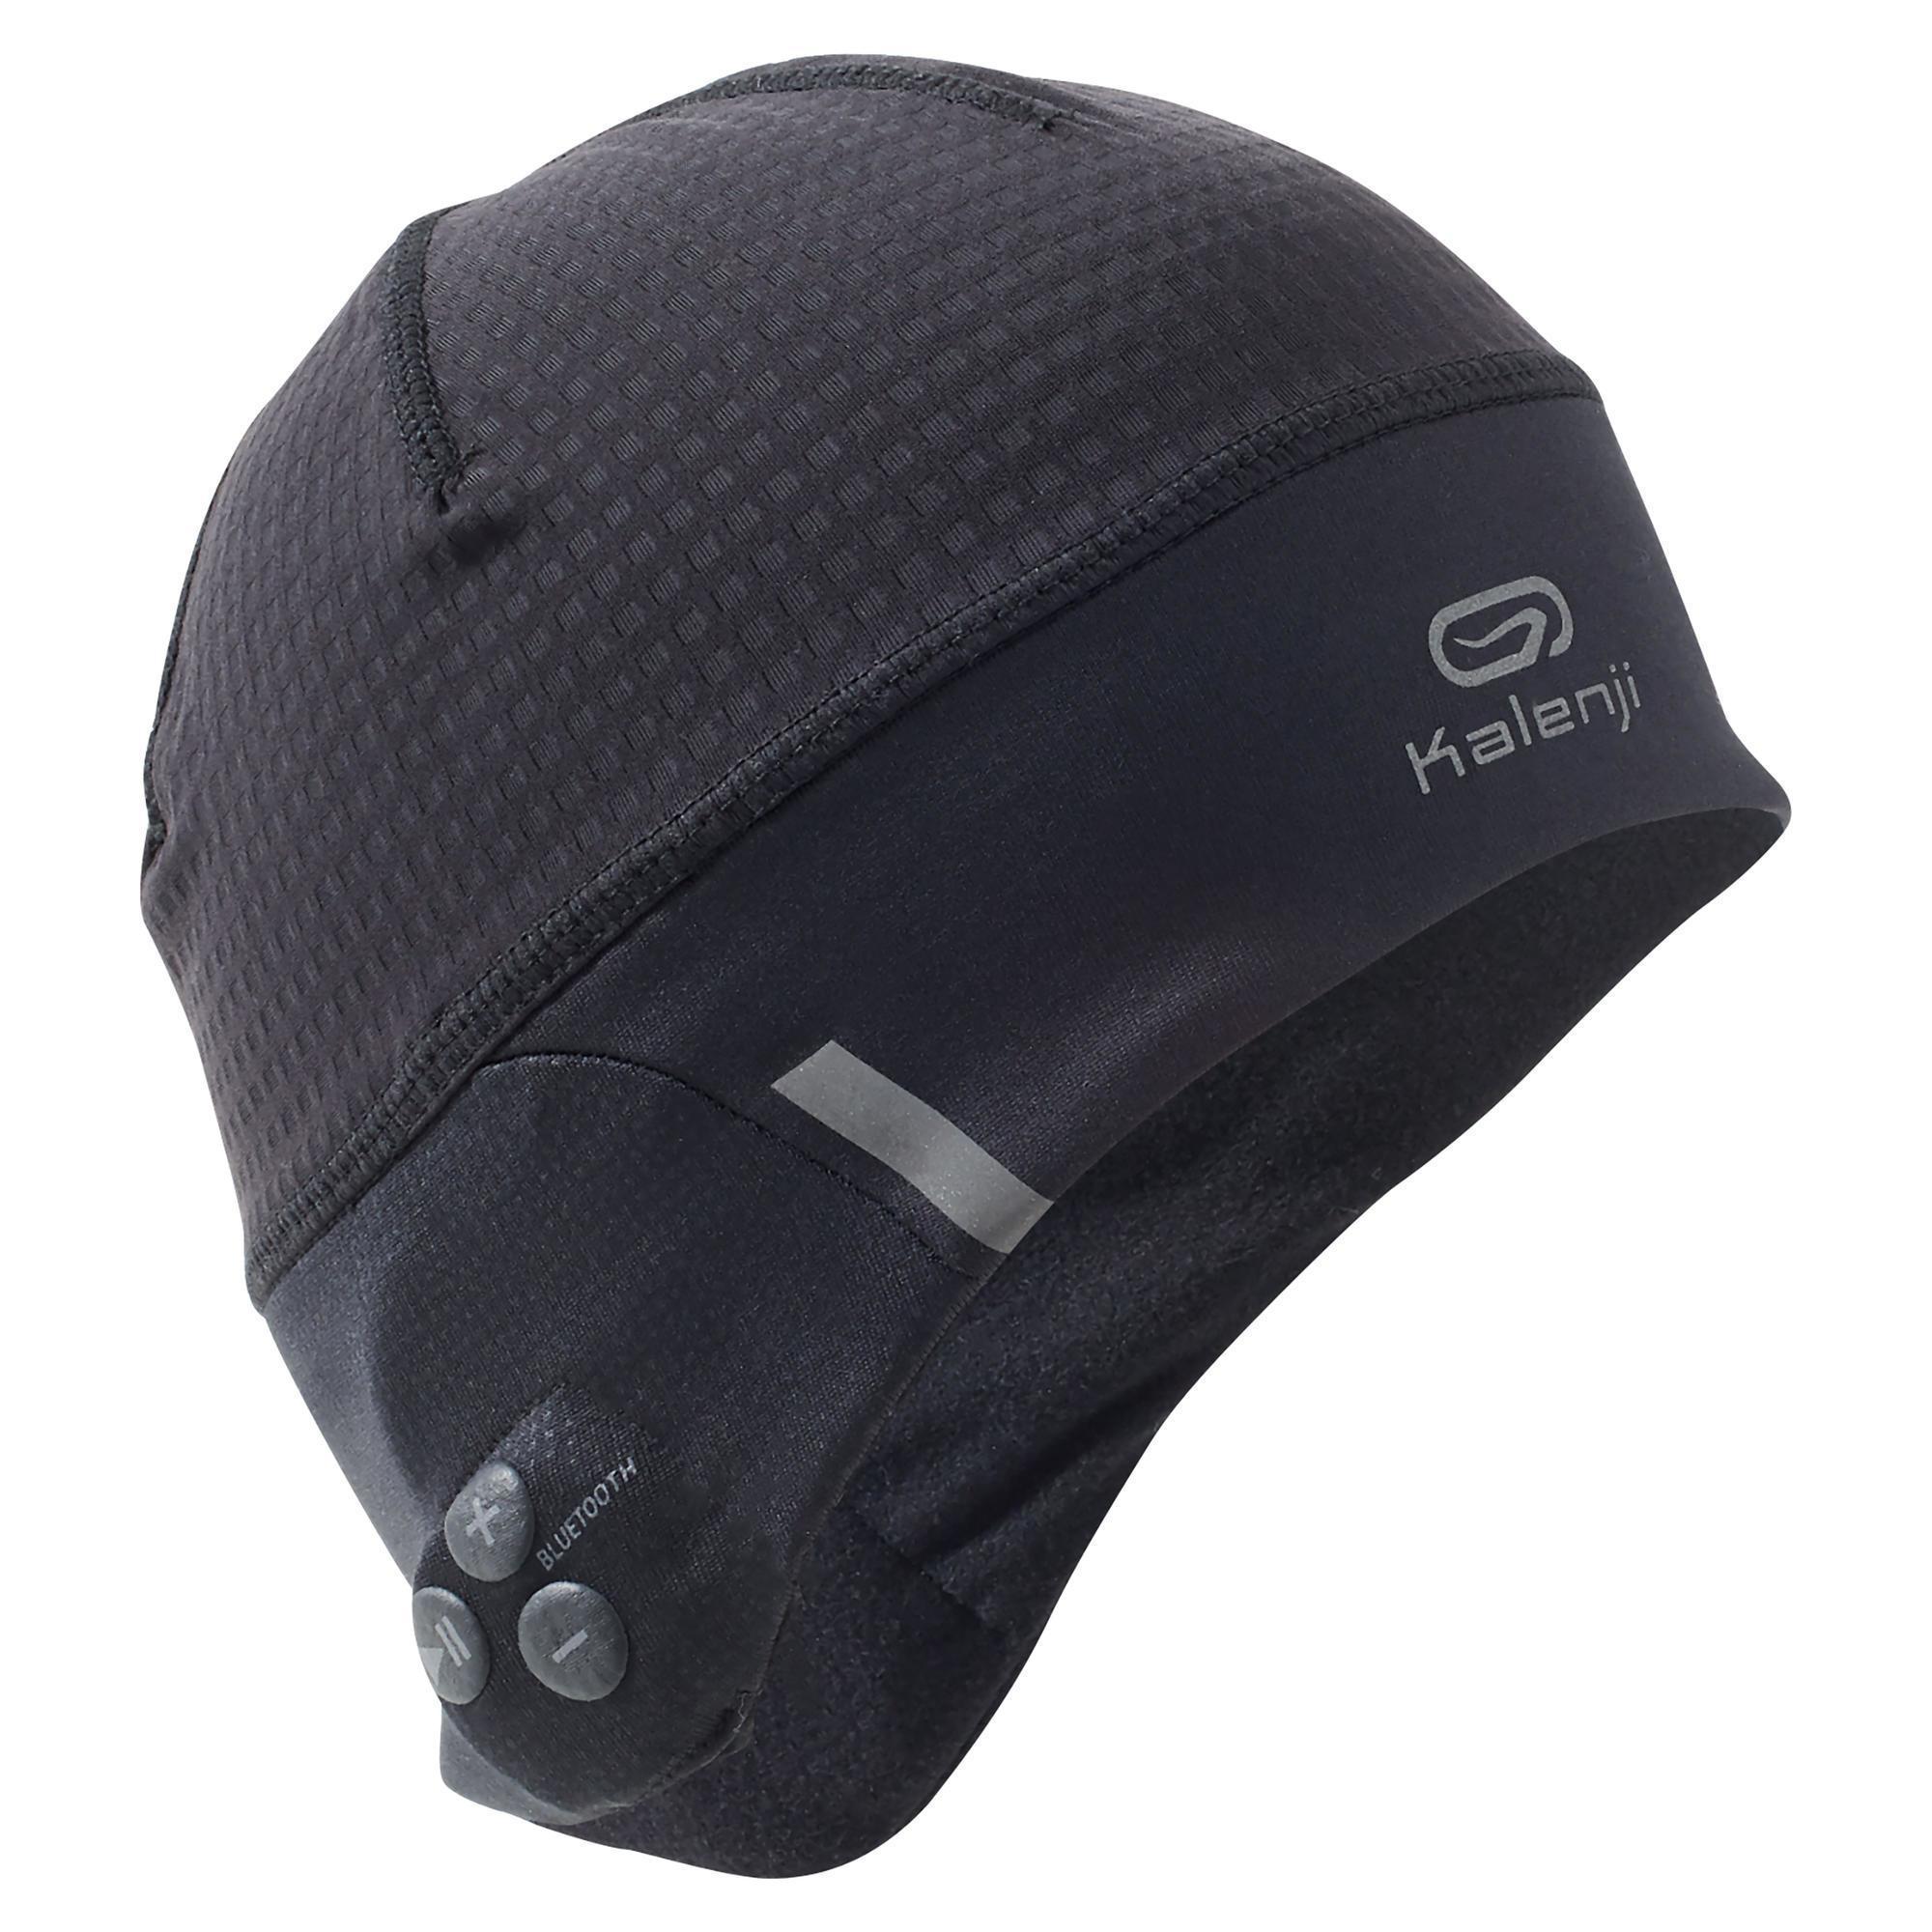 Bonnet de running Kalenji - avec écouteurs Bluetooth intégrés, 55-58 cm, noir